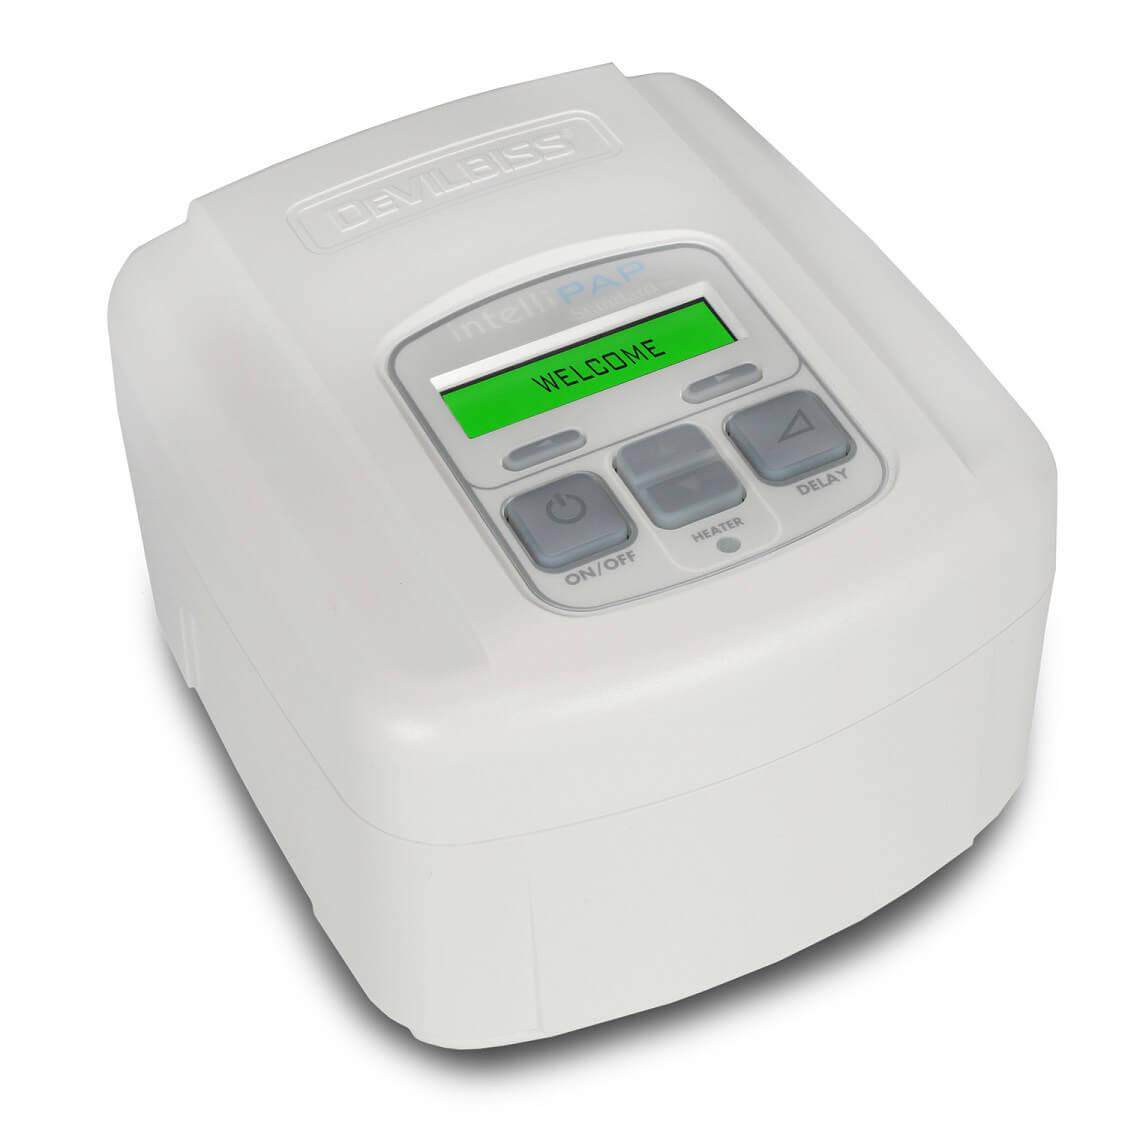 DeVilbiss intelliPAP DV51D Standard CPAP Machine with Smart Code #1DB219